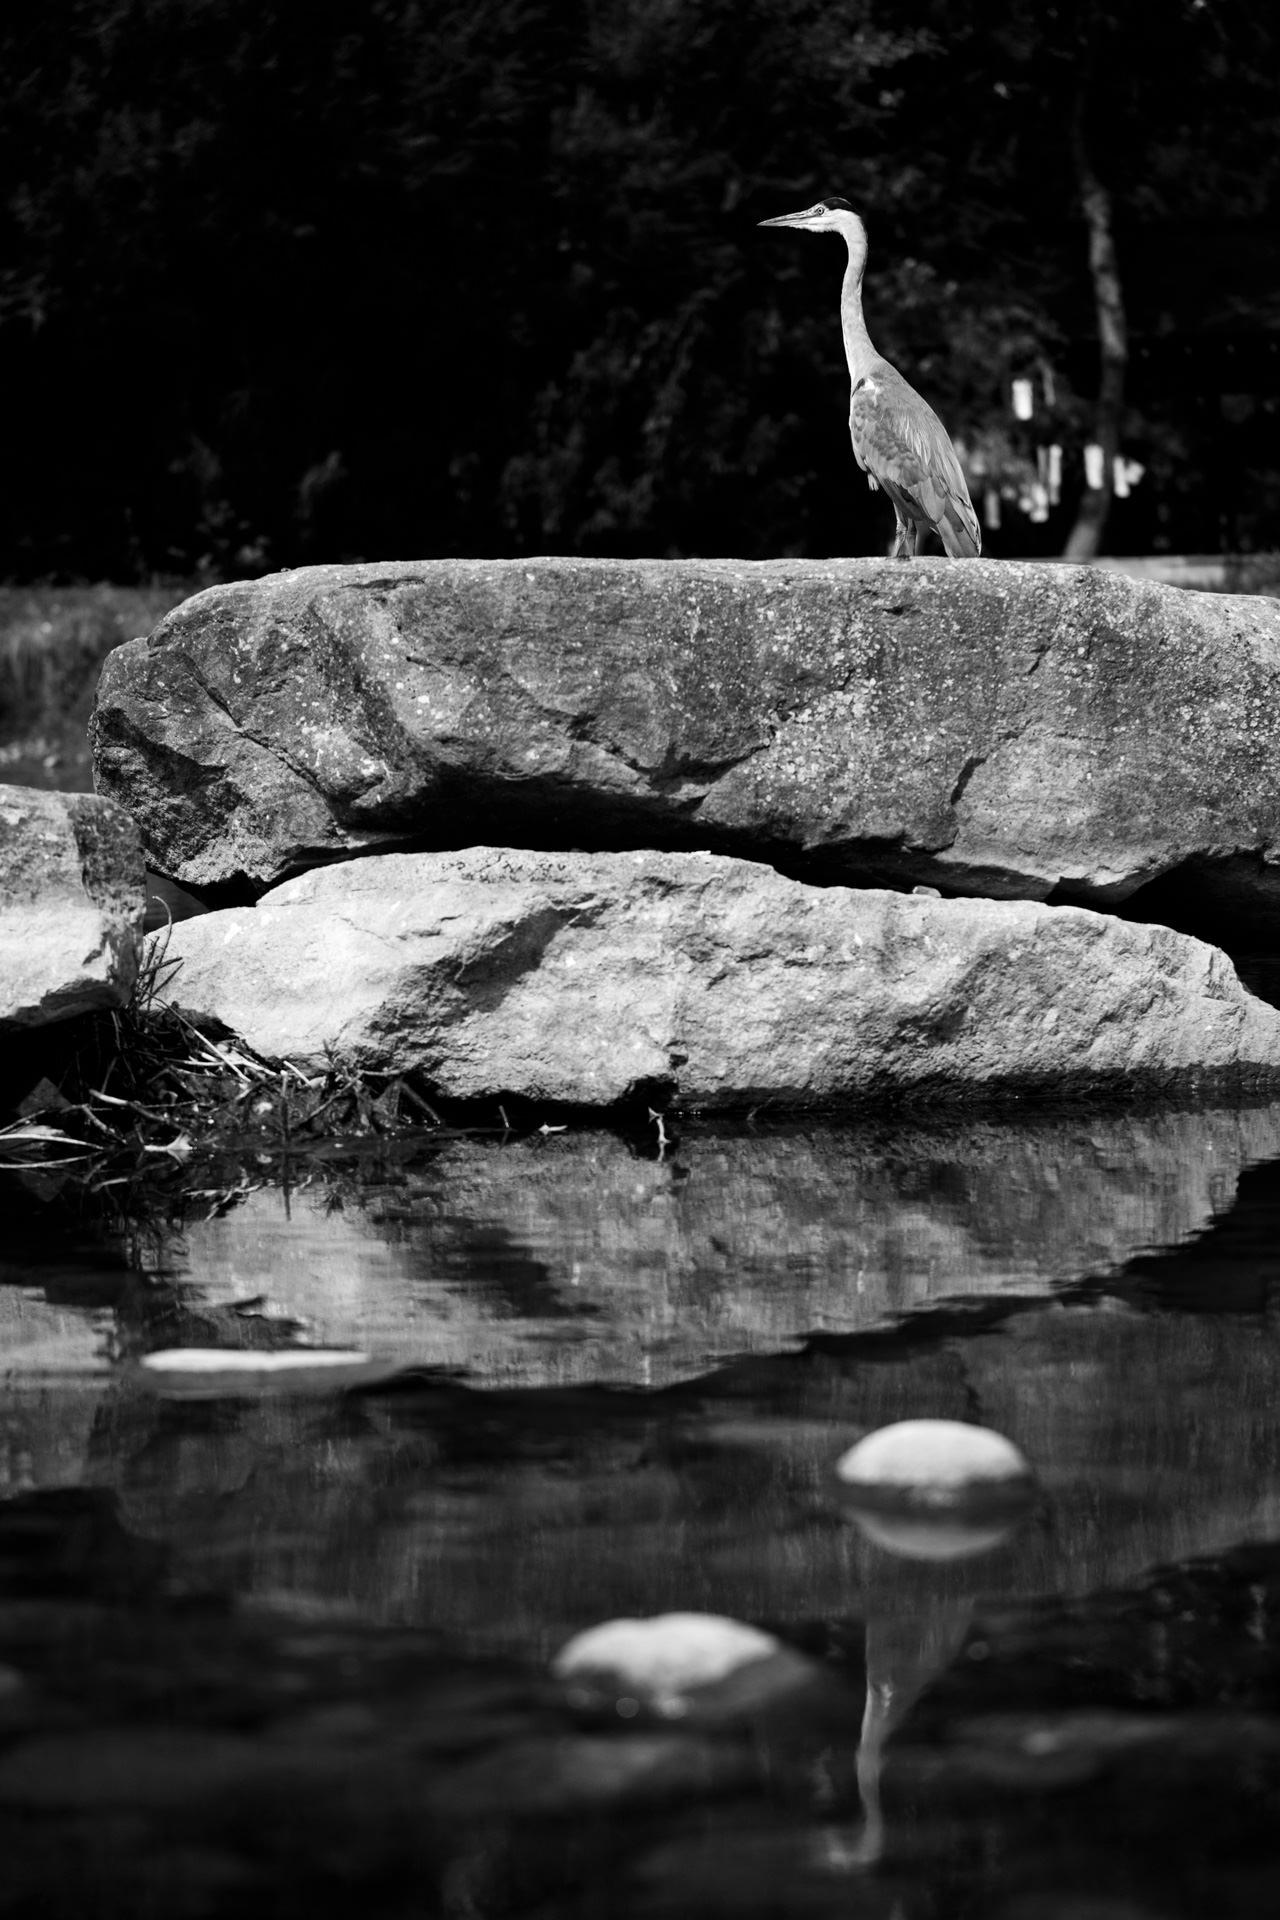 Andrew Wilson Photography Liverpool (10) Festival Gardens Chinese Pond Herron.jpg